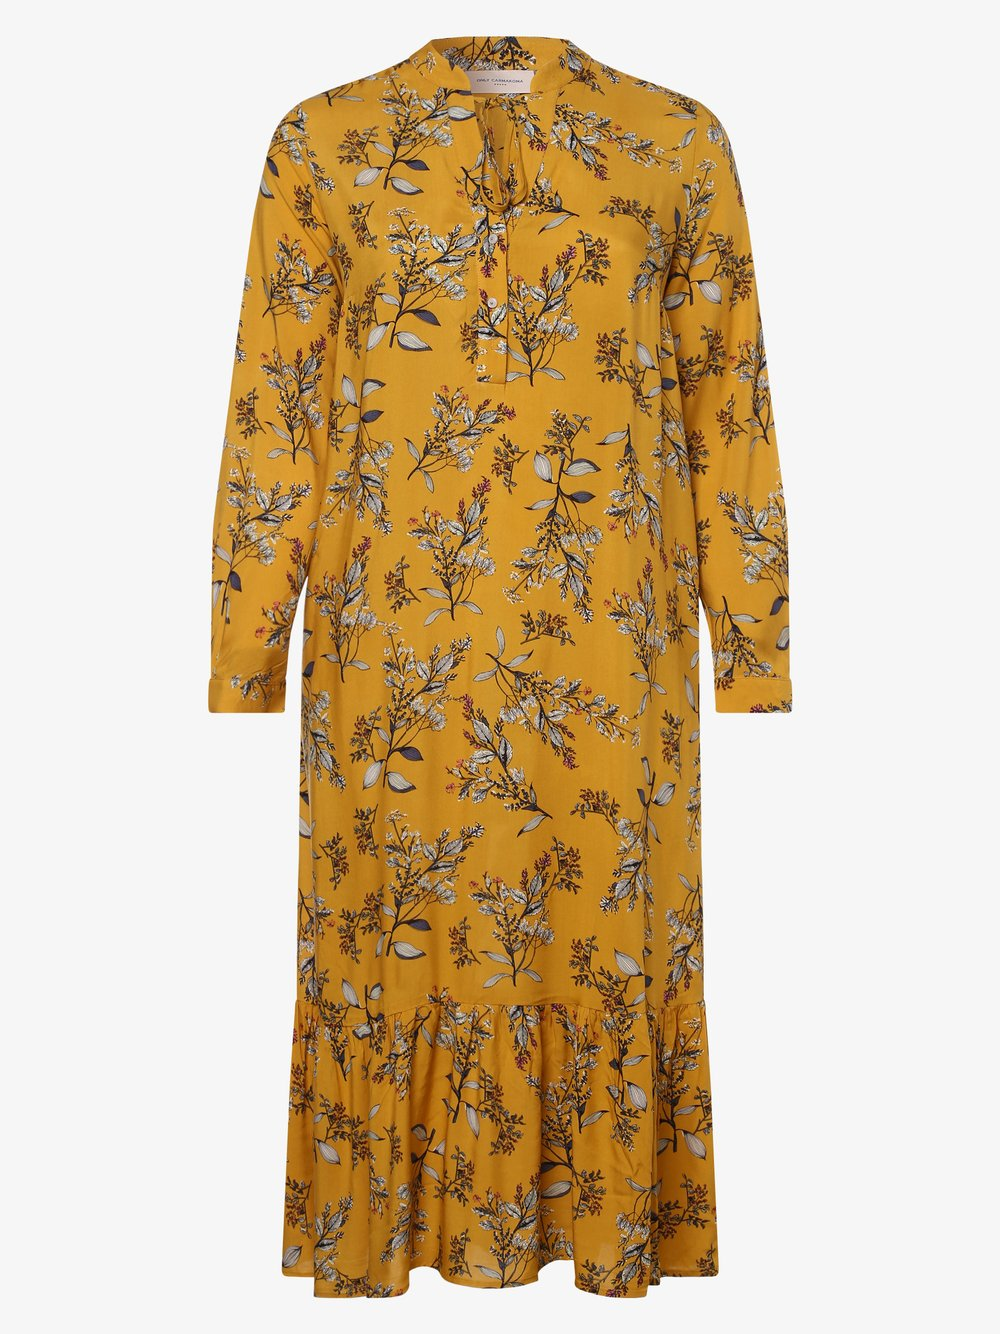 ONLY Carmakoma – Sukienka damska – Carspringi, złoty Van Graaf 476886-0001